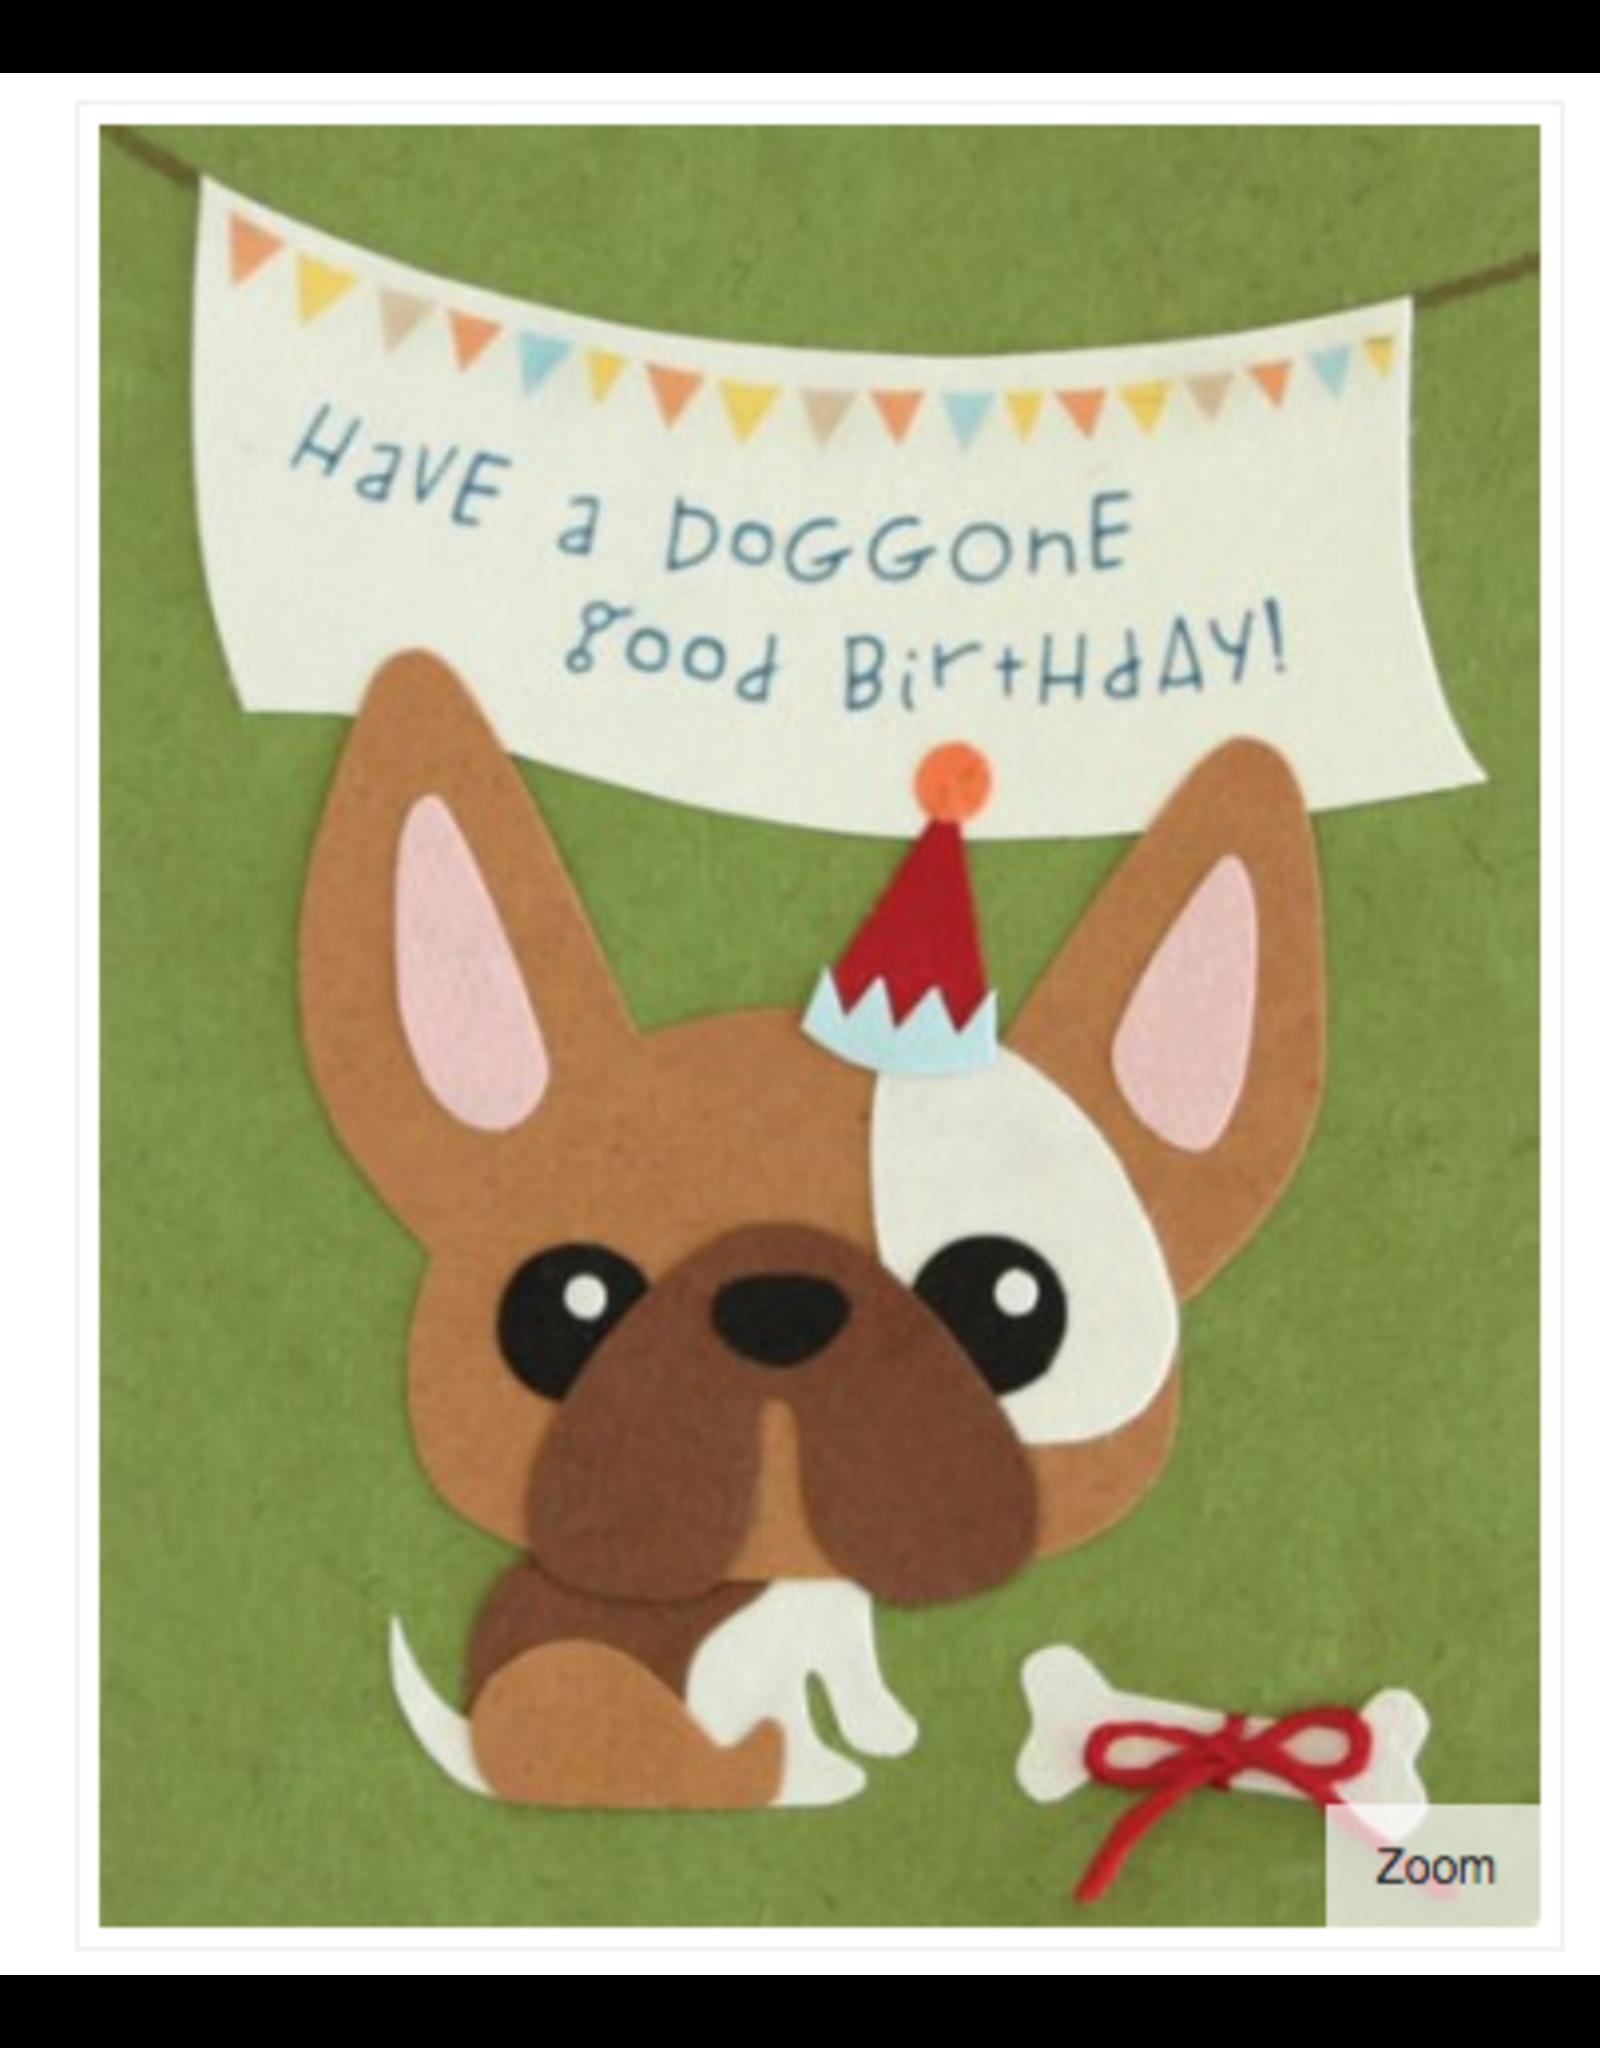 Doggone Birthday Card, Philippines